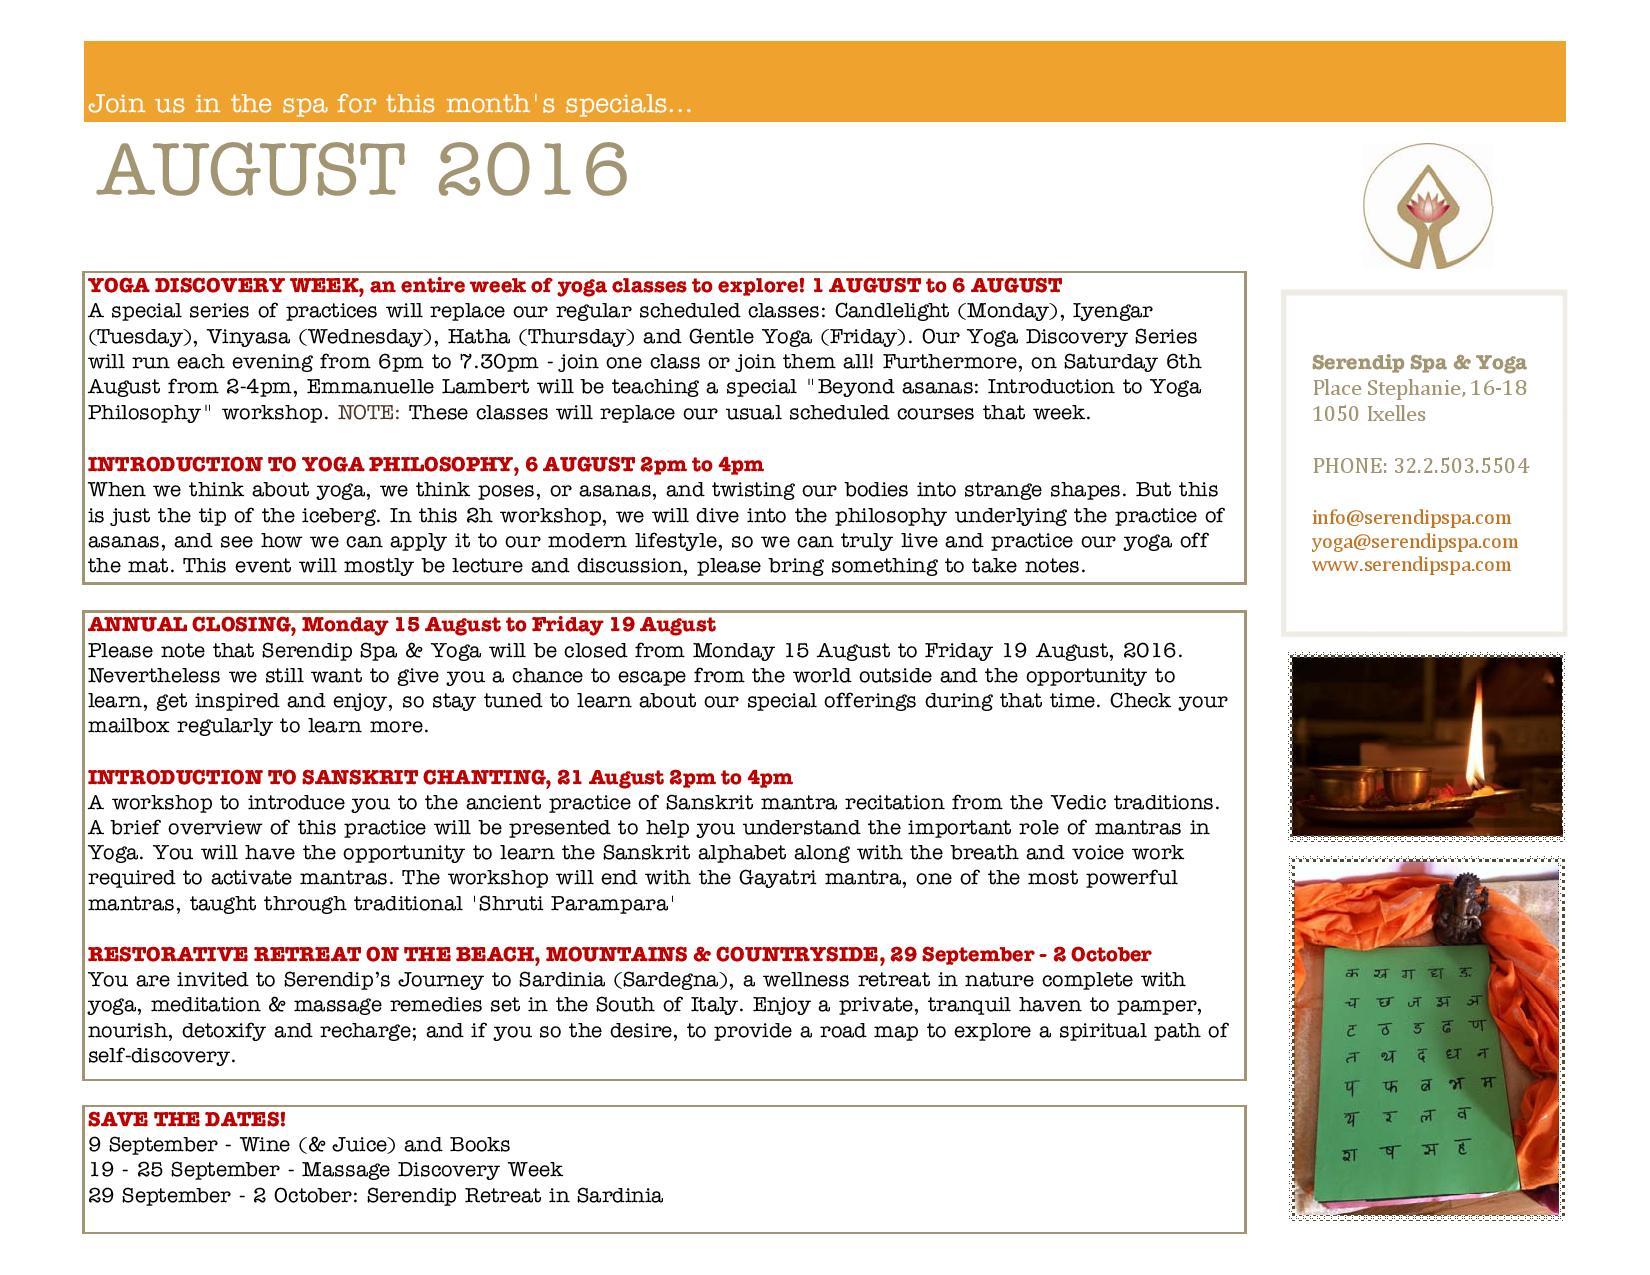 Serendip Spa and Yoga Calendar 2016_August BACK A4-page-001.jpg